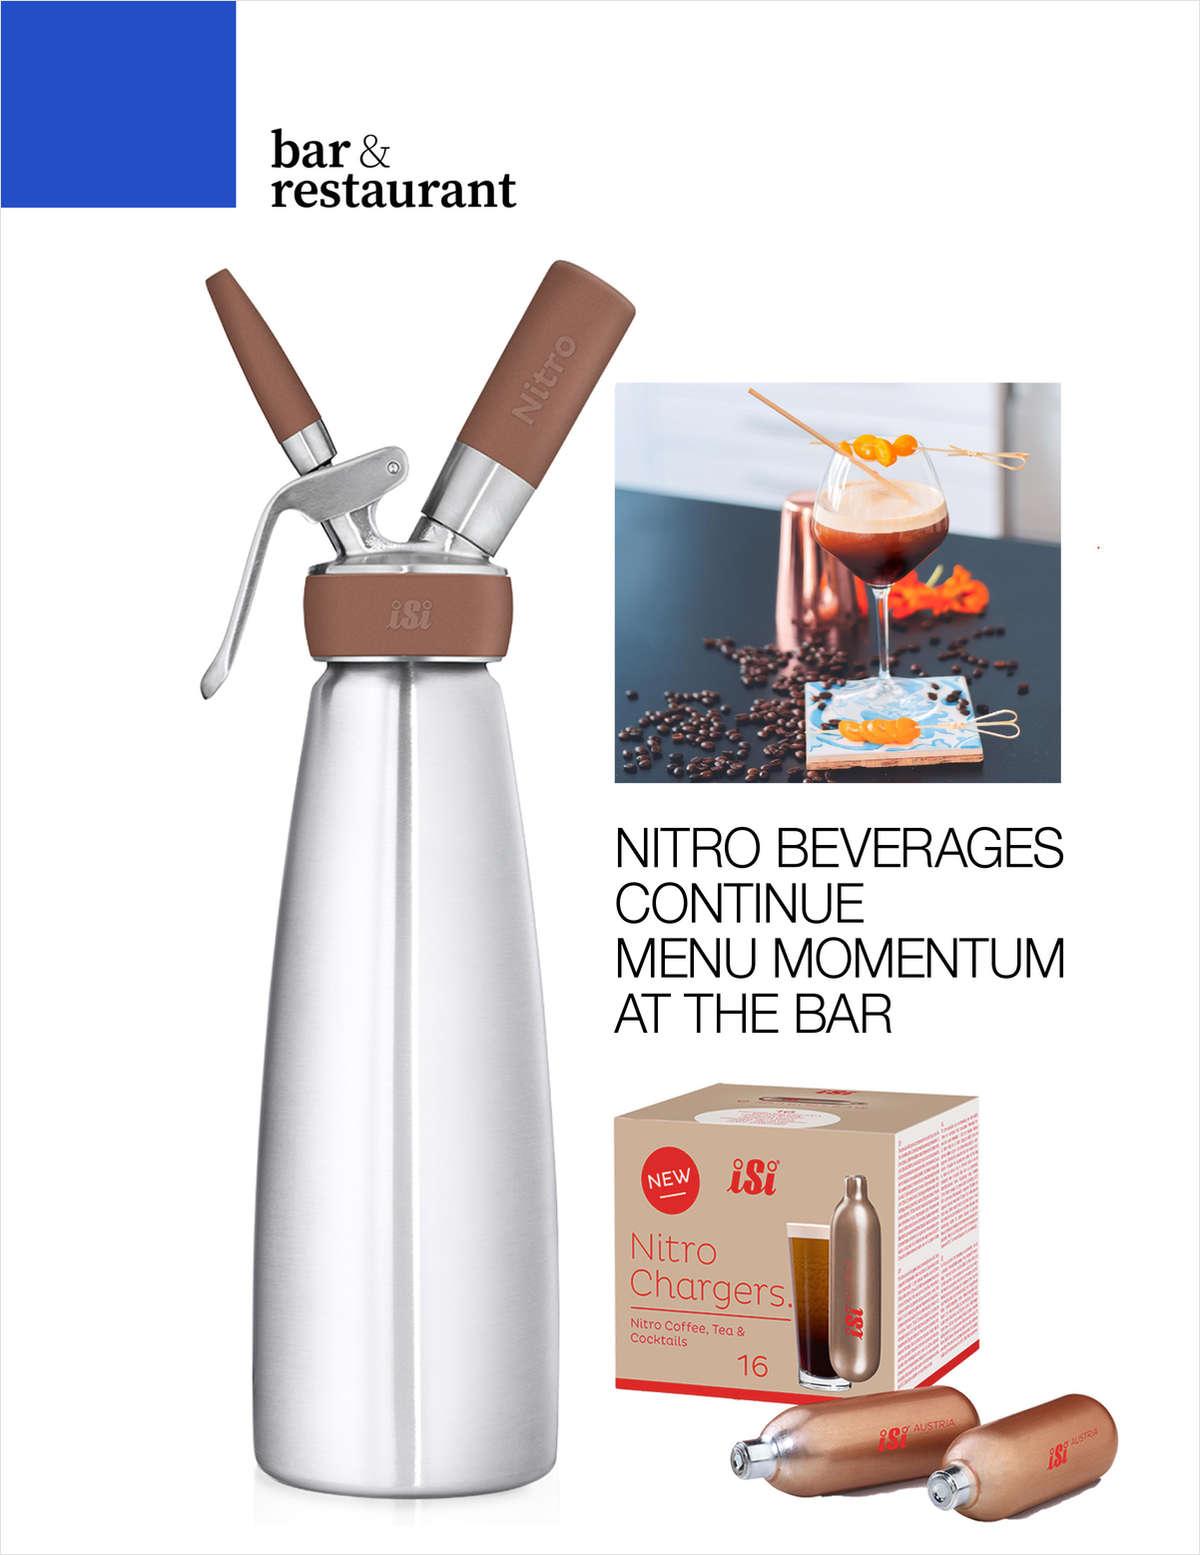 Nitro Beverages Continue Menu Momentum at the Bar